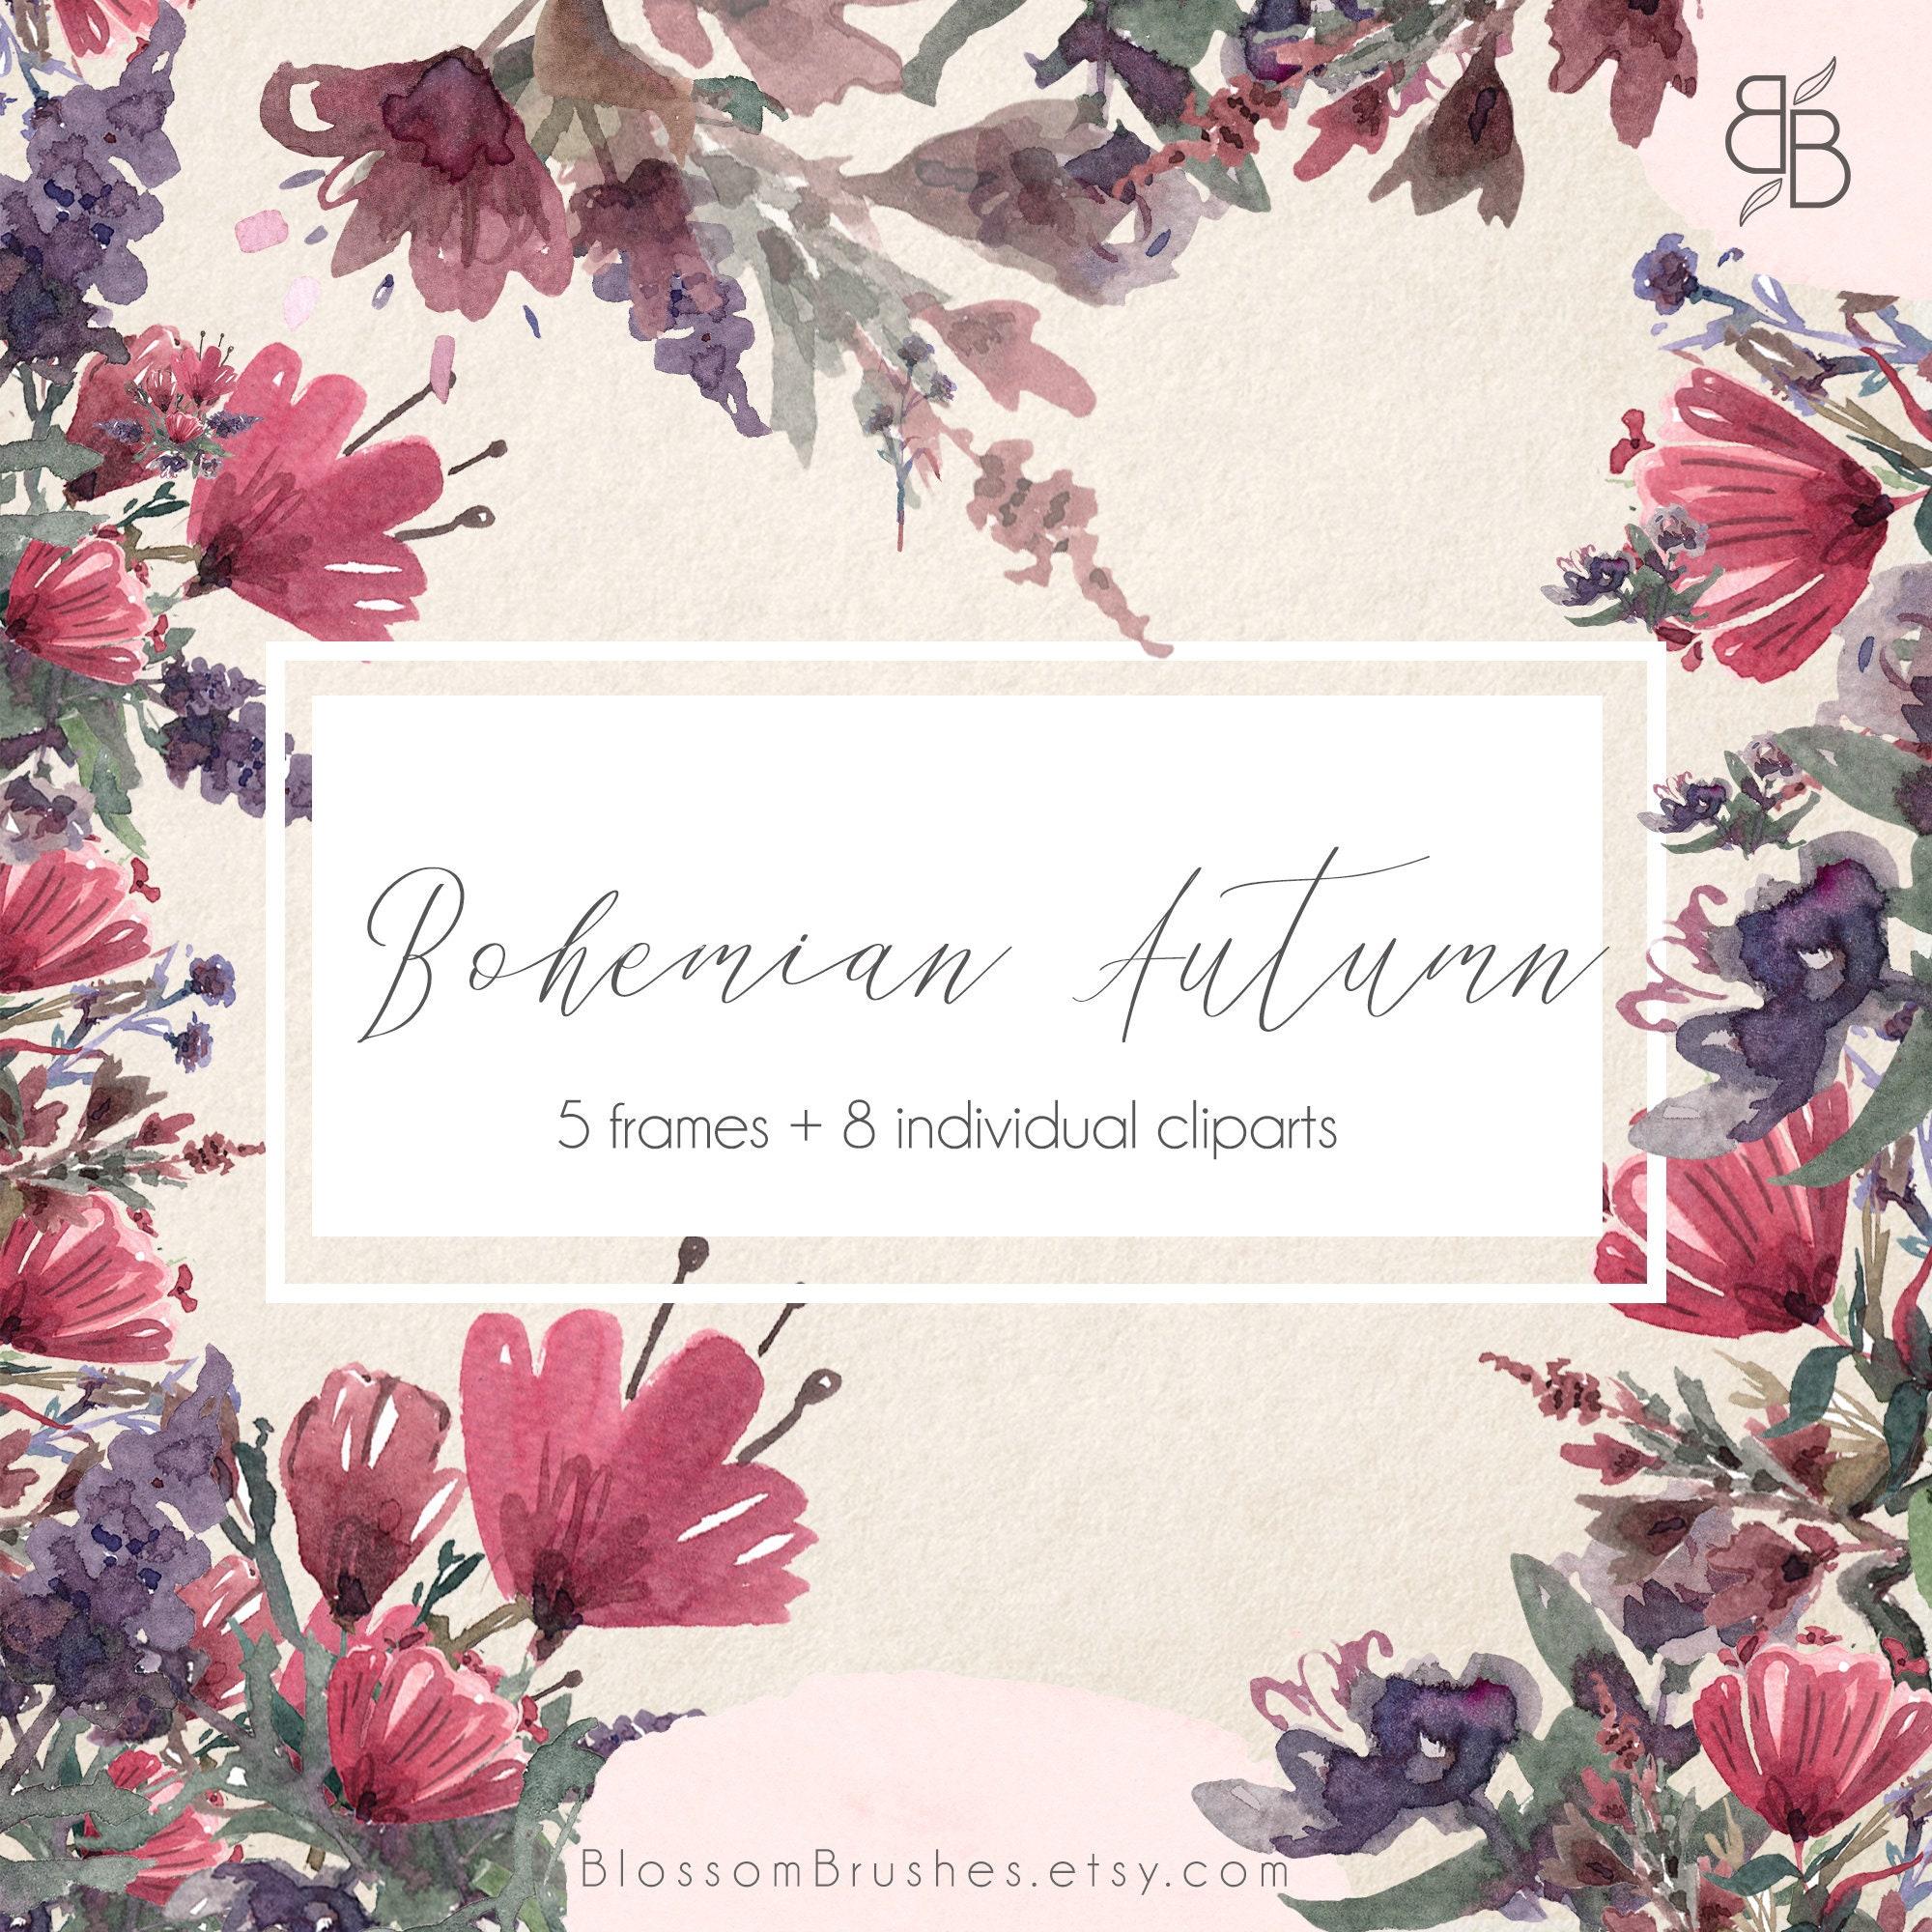 845262c9a1ba Bohemian autumn floral borders and frames floral clipart etsy jpg 2000x2000  Etsy olive leaf frame clipart